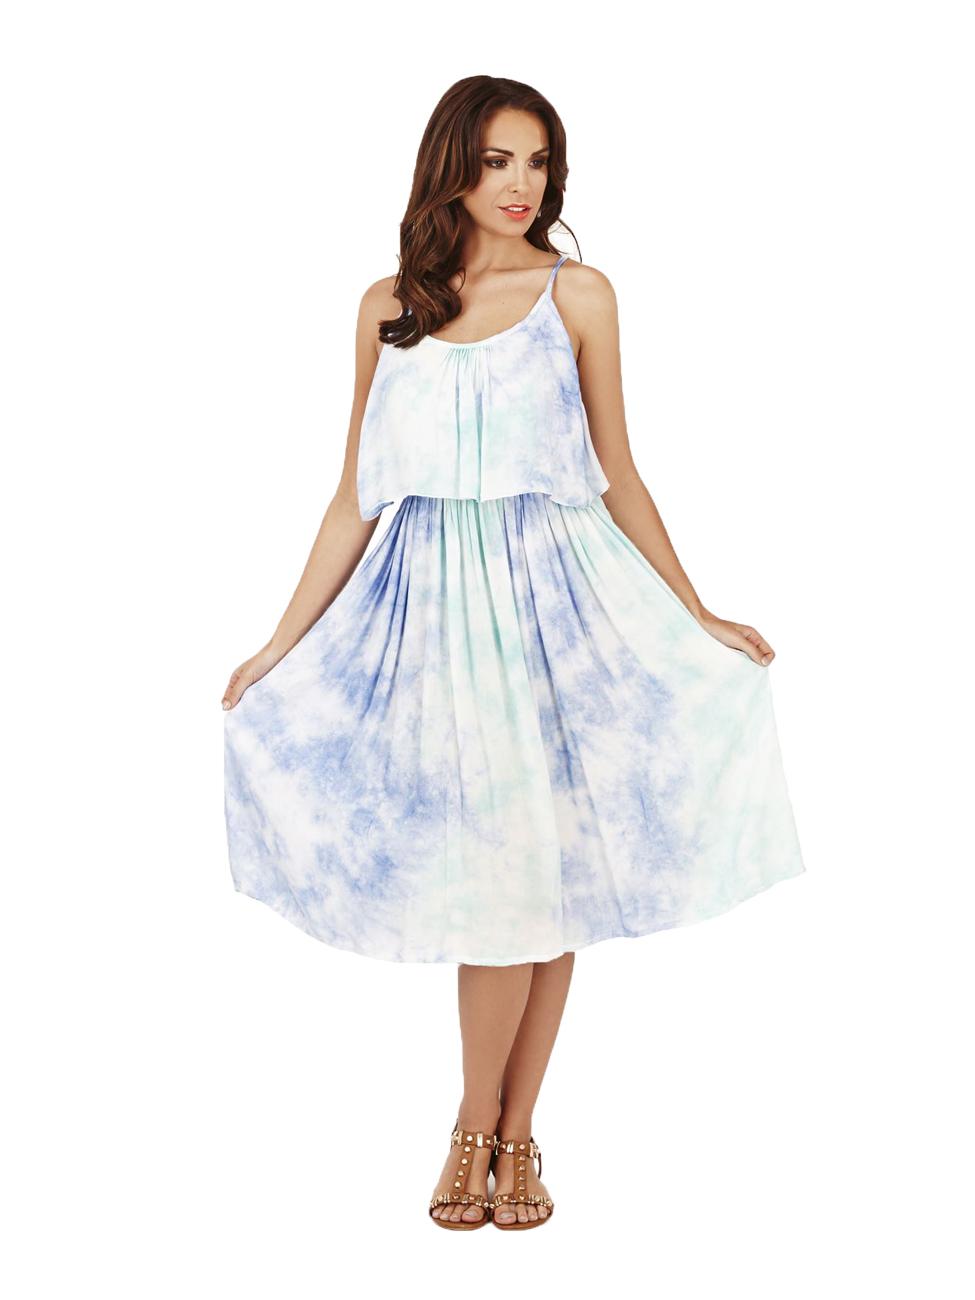 62b75e72c03 Pistachio Tie Dye Knee Length Dress Summer Holiday UK 8-22 Aqua White